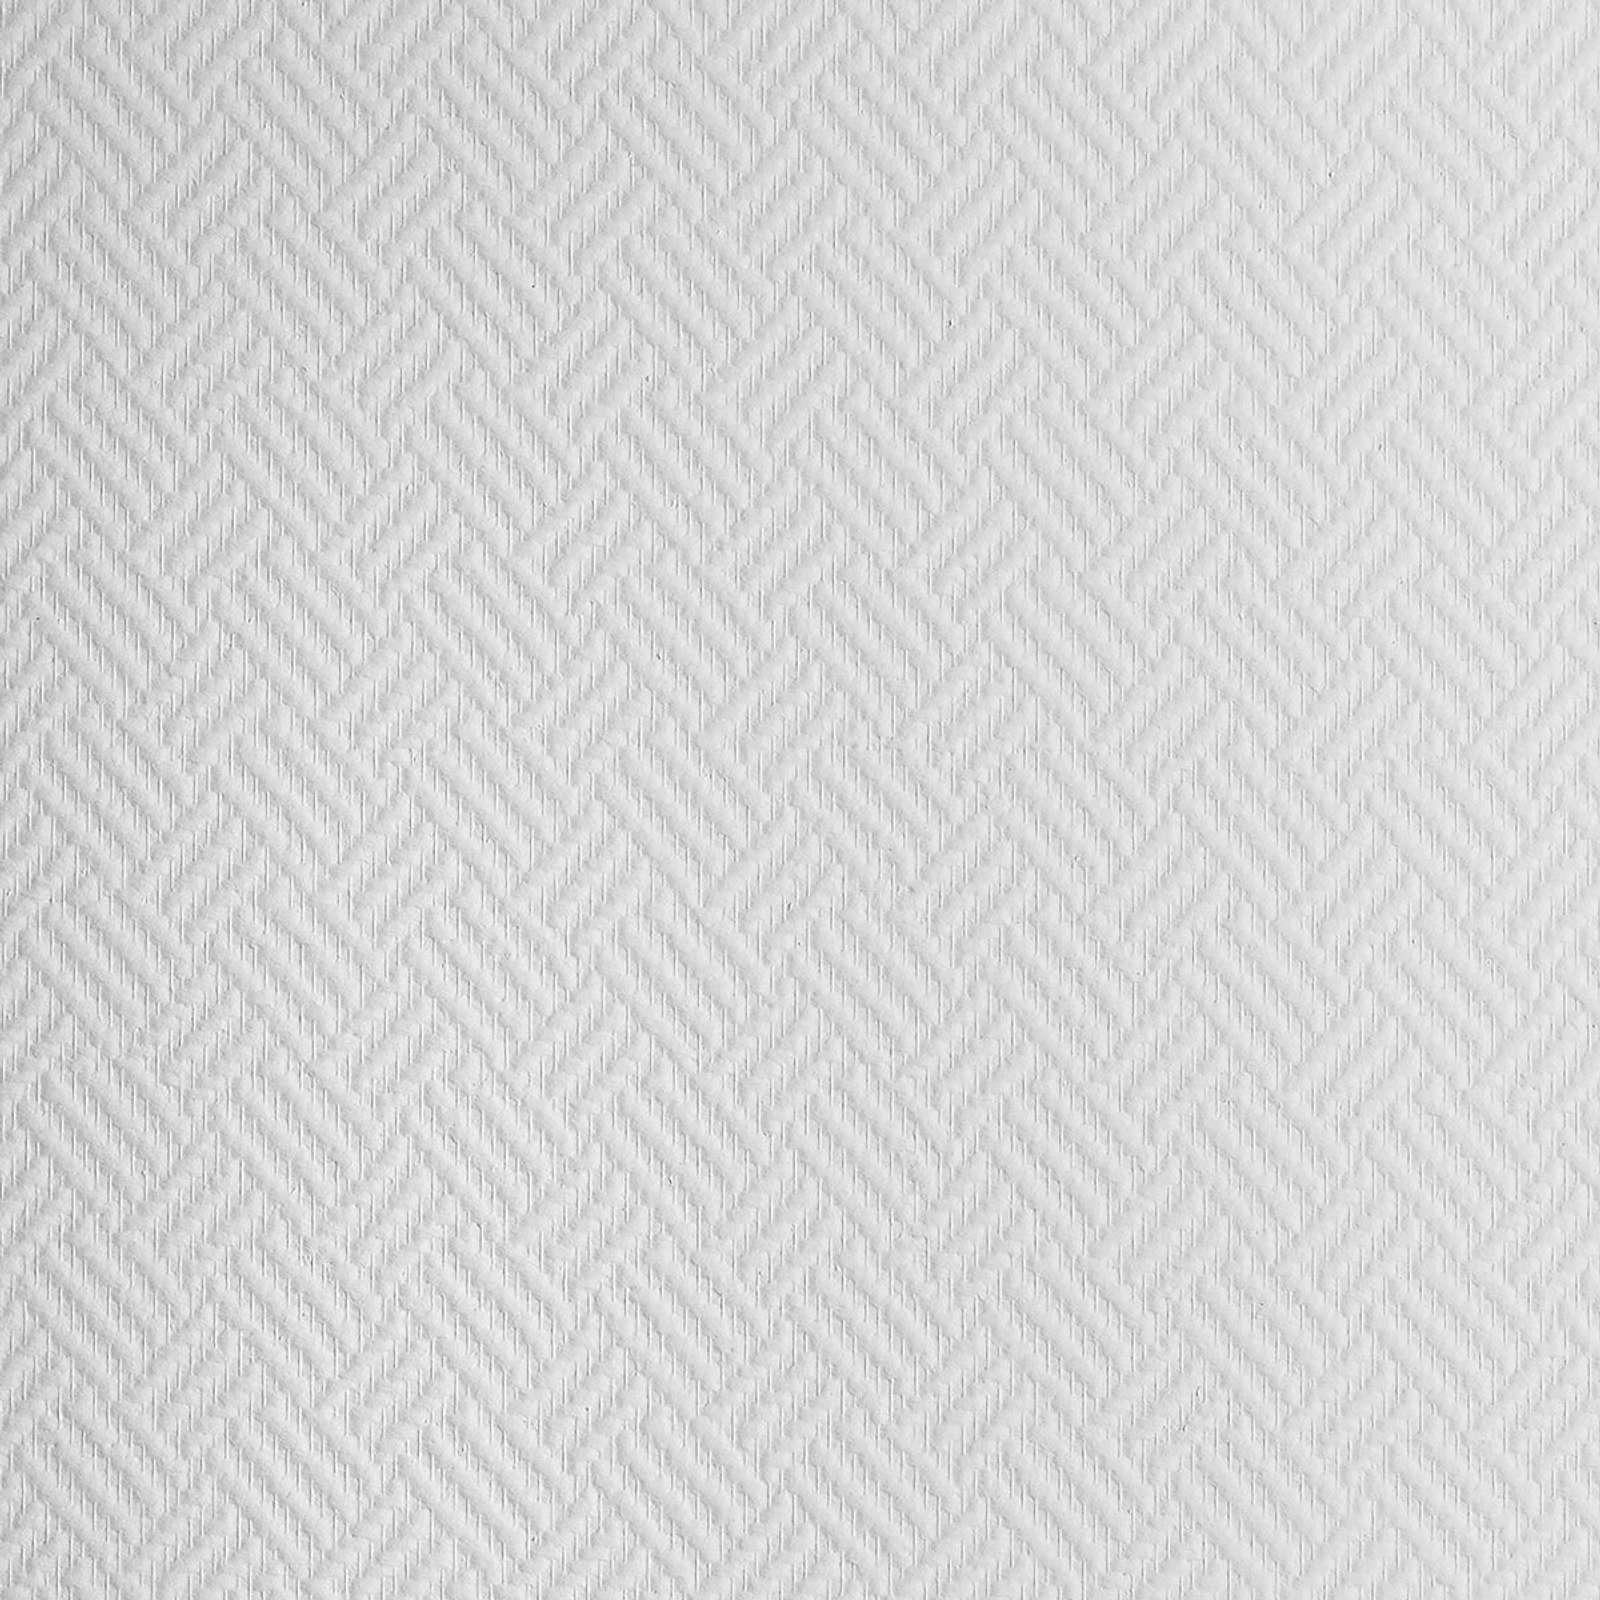 Стеклообои Wellton WO480 Паркет (1мх25м)